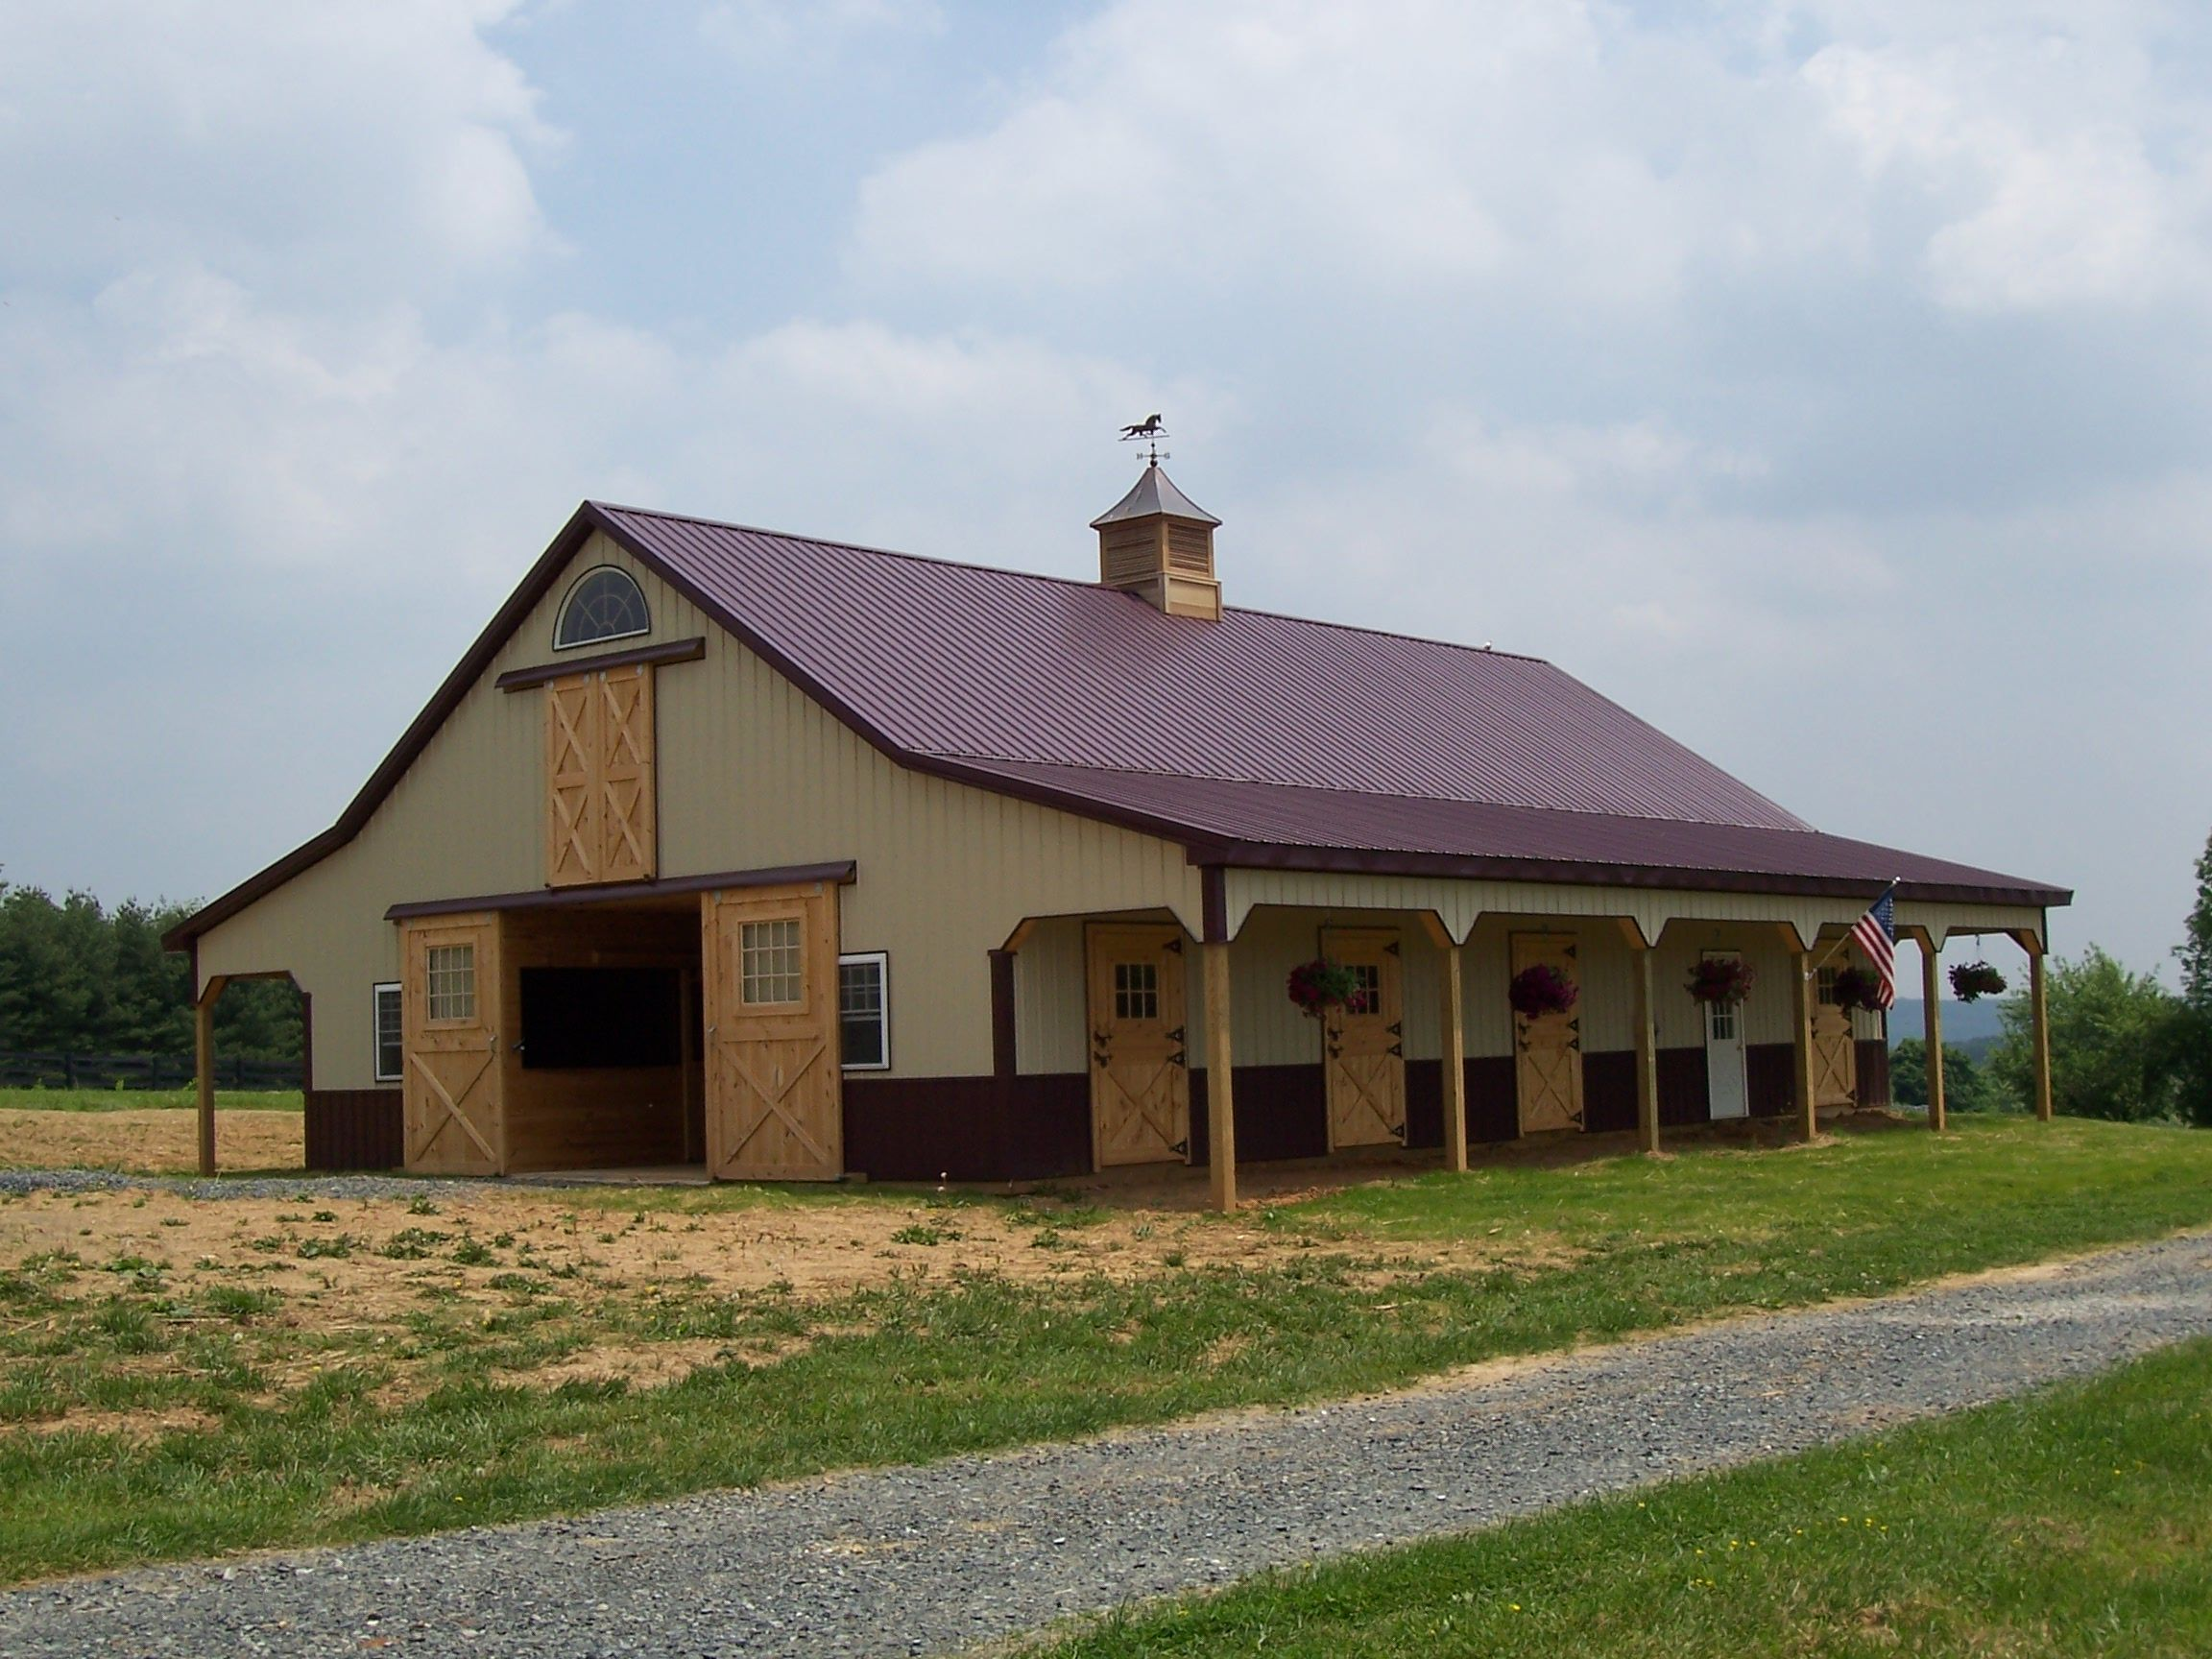 Best Burgundy Roof Barn Roof Metal Roof Houses Pole Barn 400 x 300